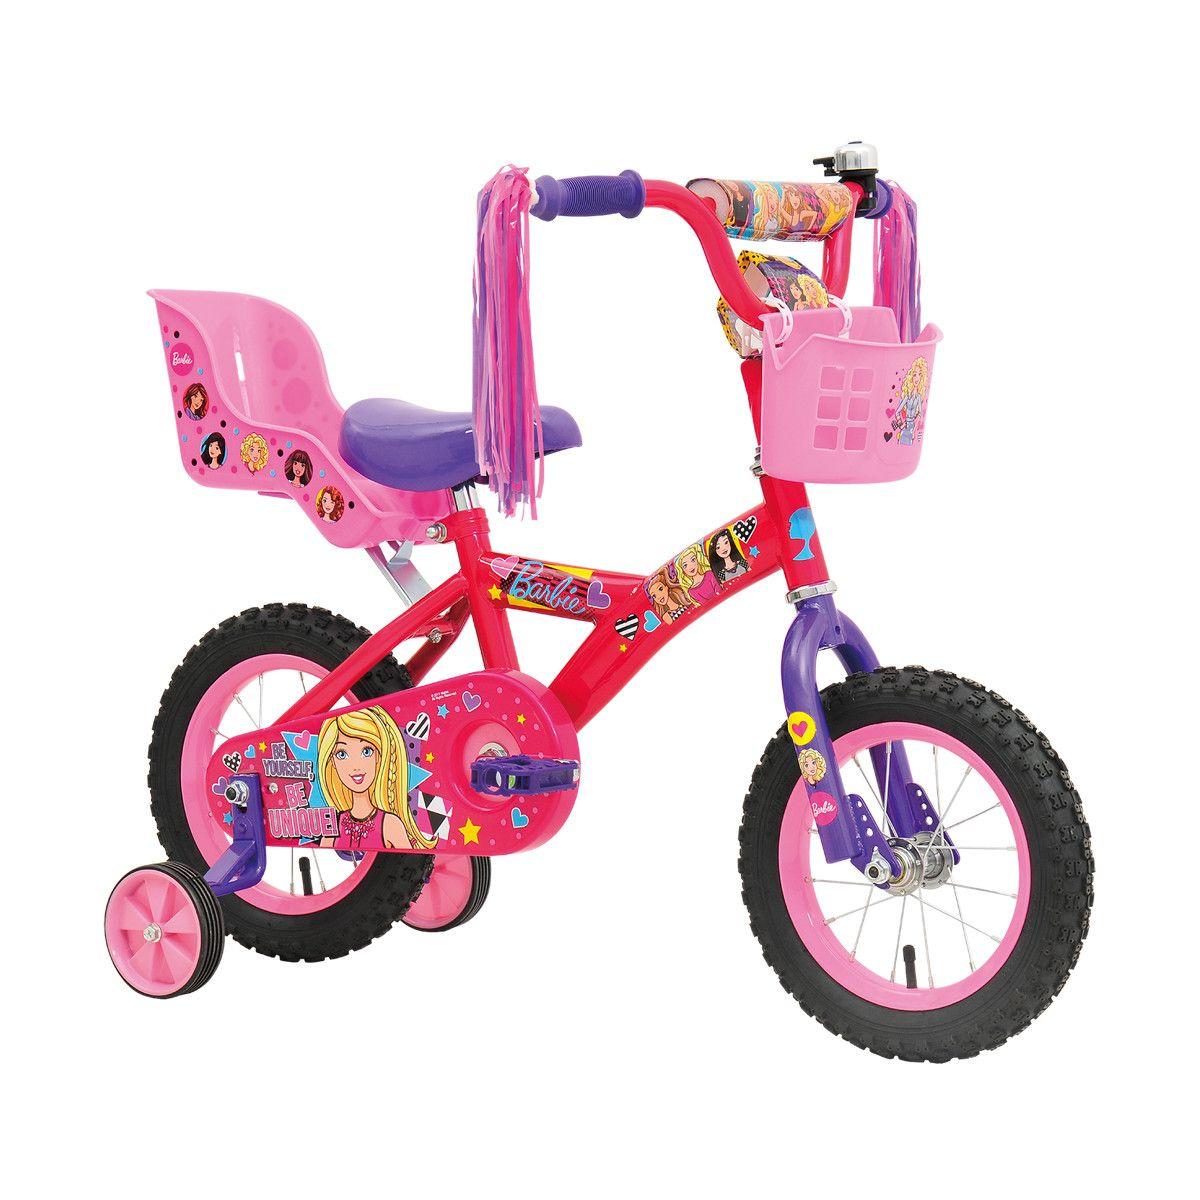 d0a8806ada1 30cm Barbie Bike | Kmart | Xmas 2018 | Barbie bike, Bike, Barbie